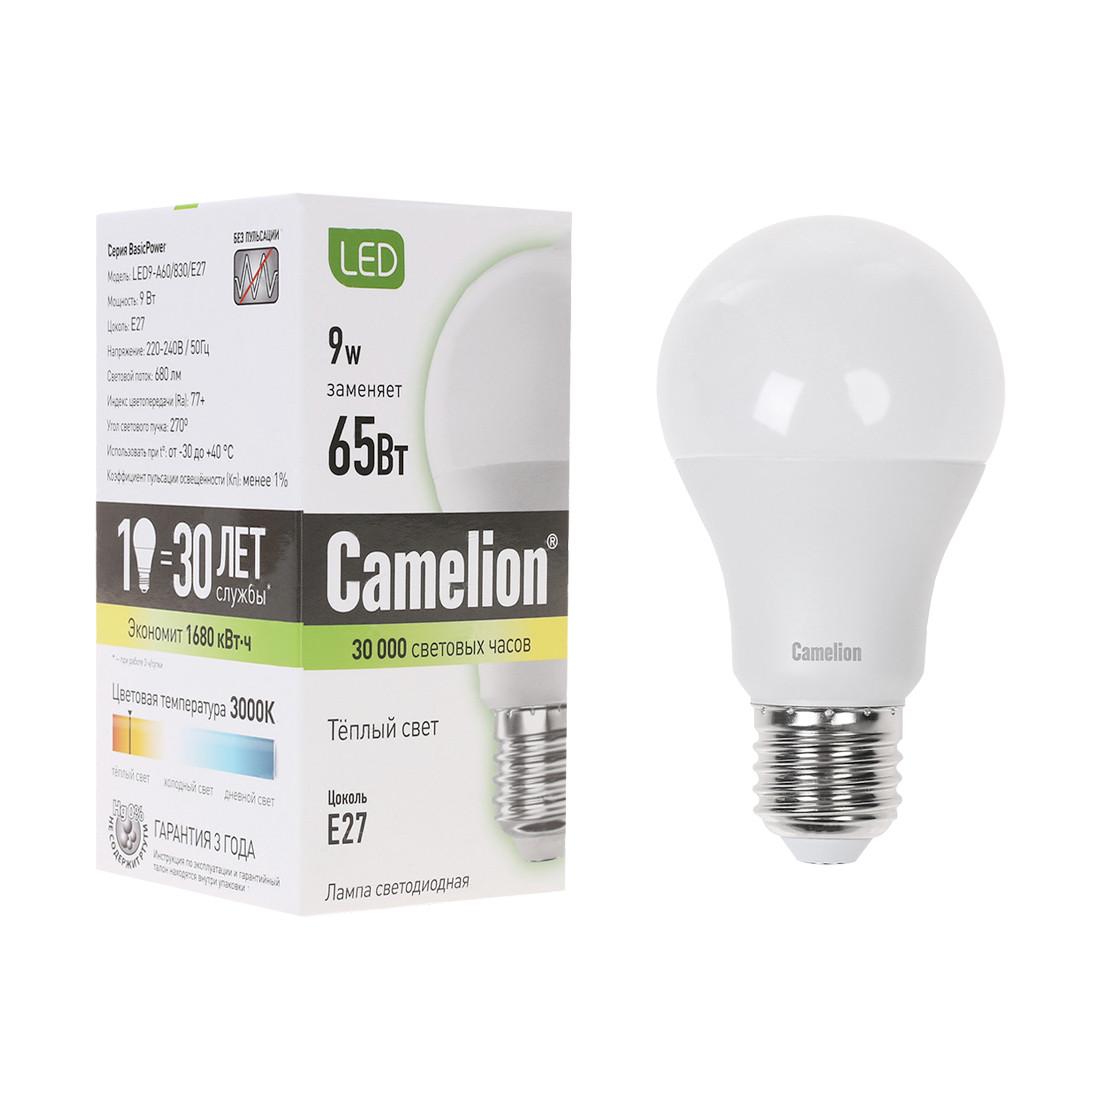 Лампа светодиодная Camelion А60/3000К/E27/9Вт, Тёплый